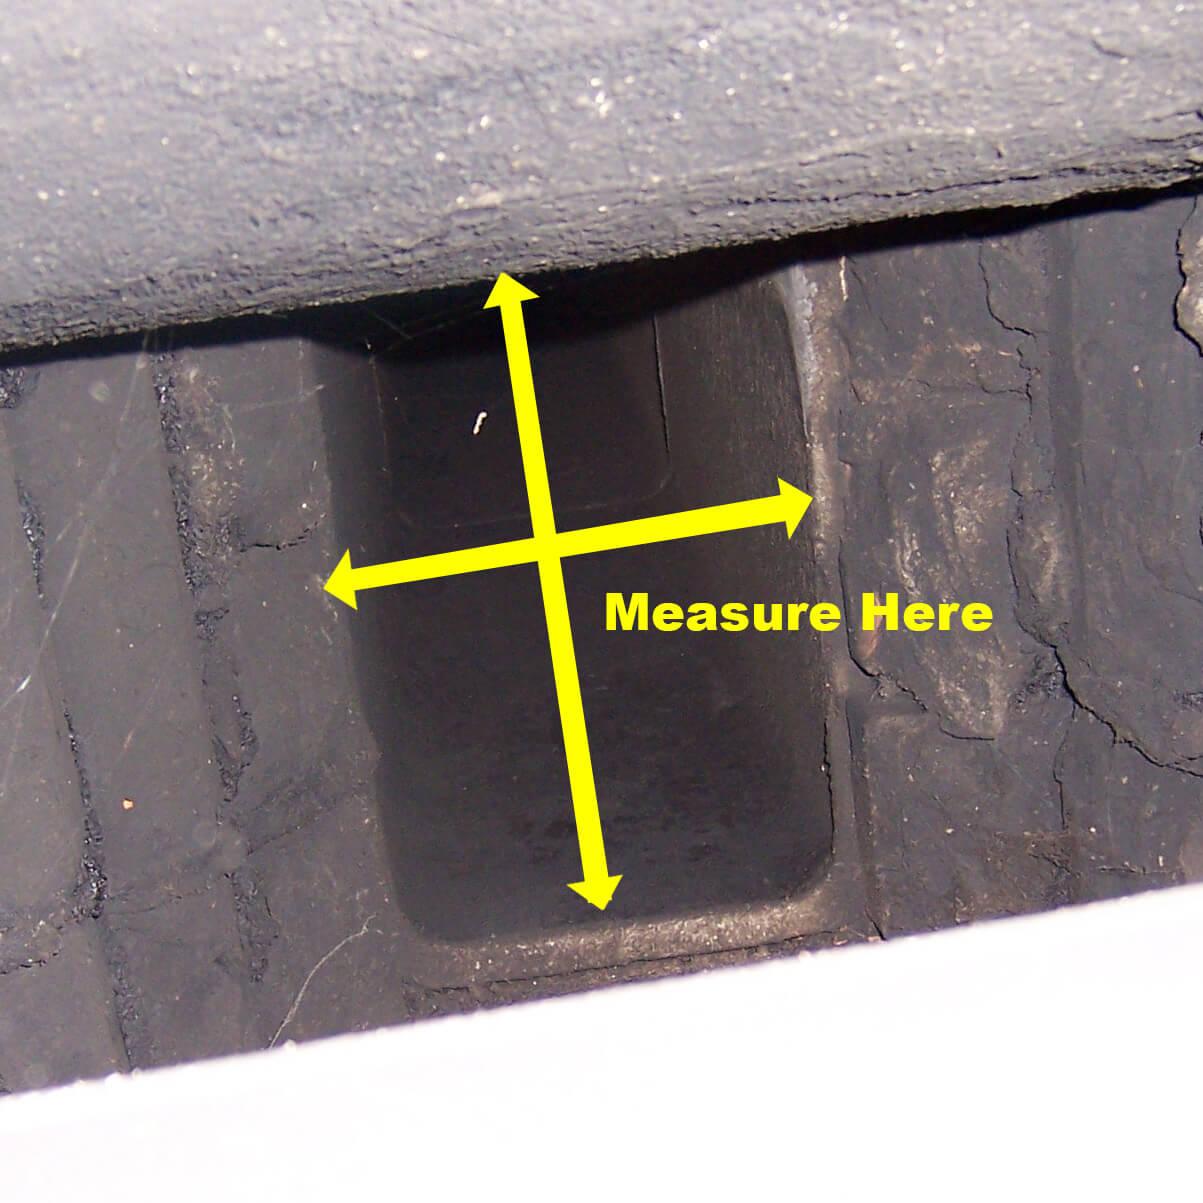 Chimney Flue Tile Measurement